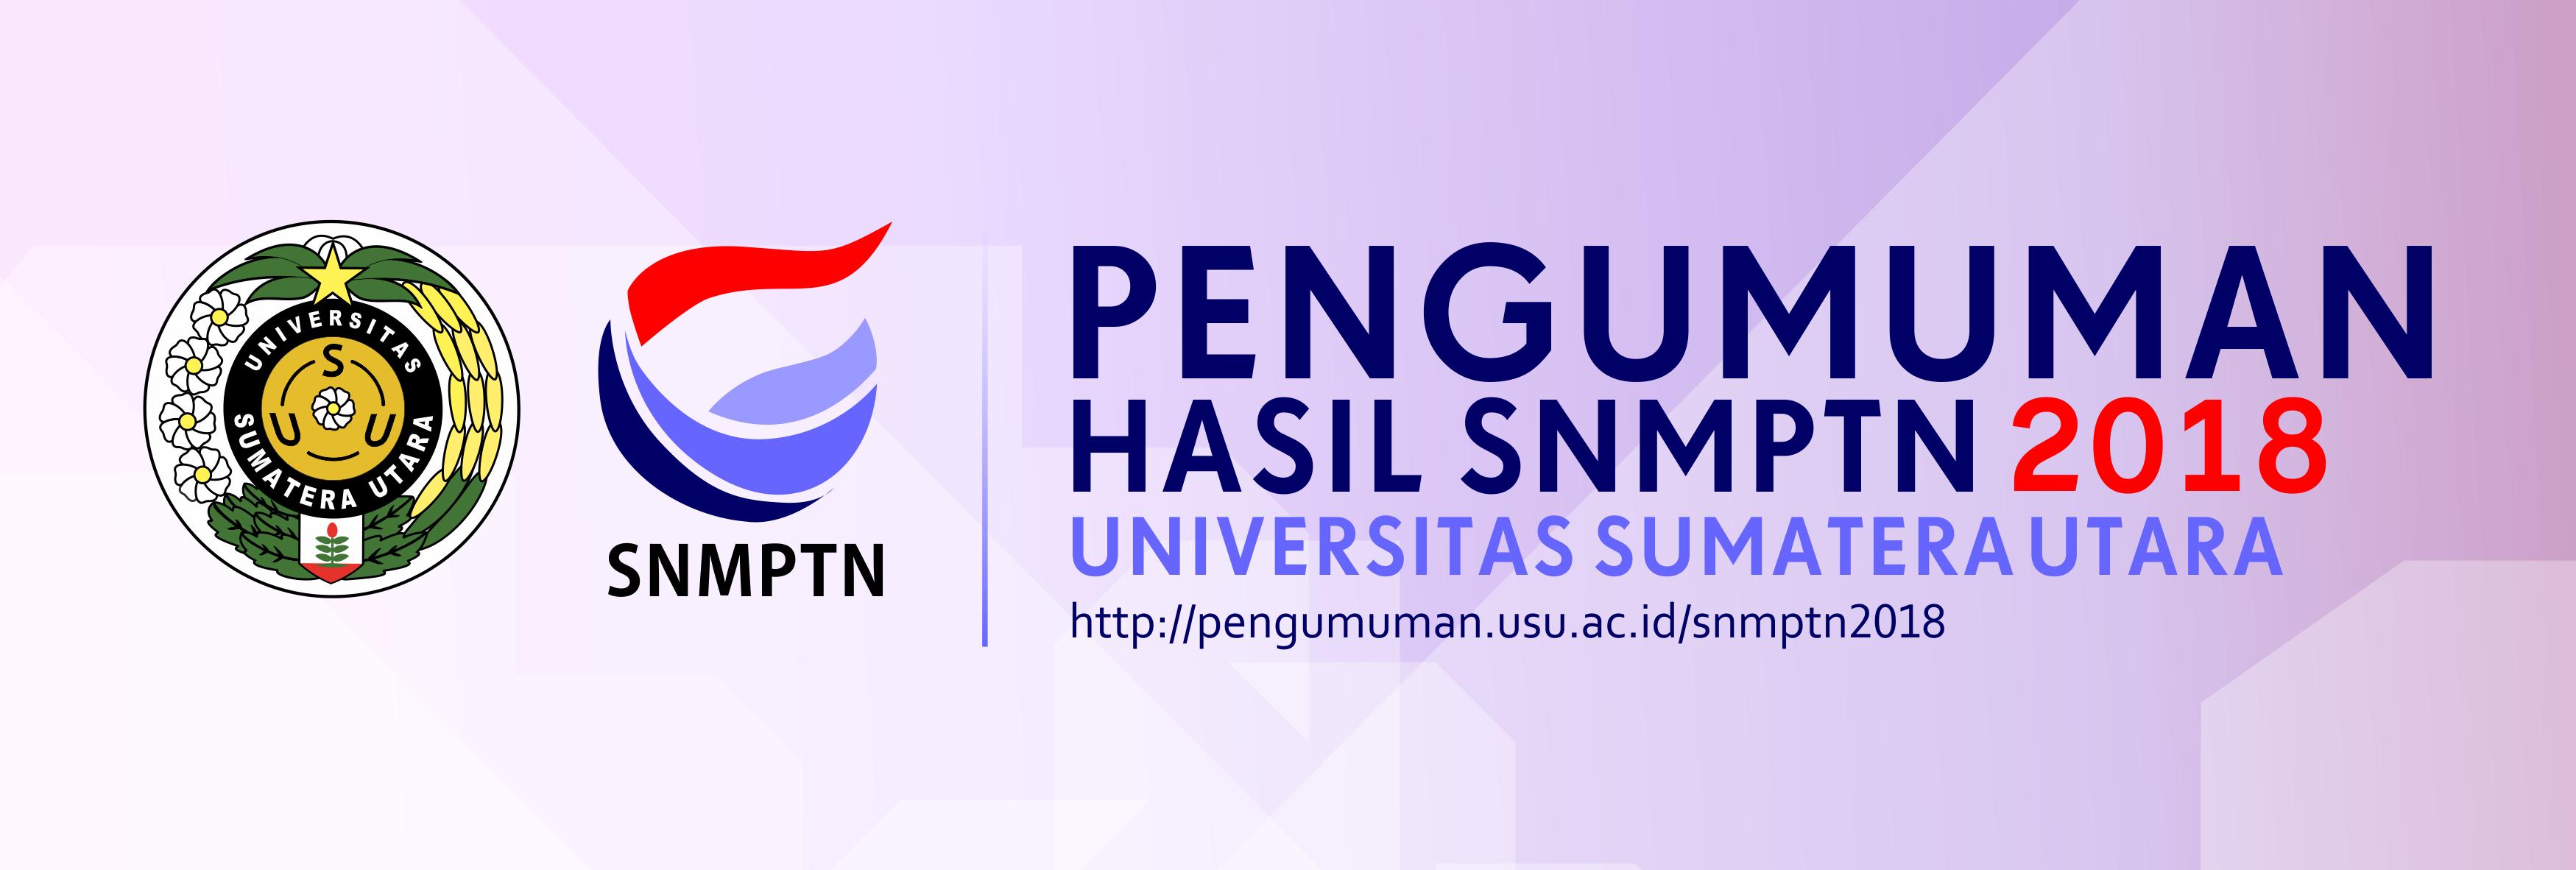 Universitas Sumatera Utara Beranda Pengumuman Hasil Snmptn 2018 Penangkaran Rusa